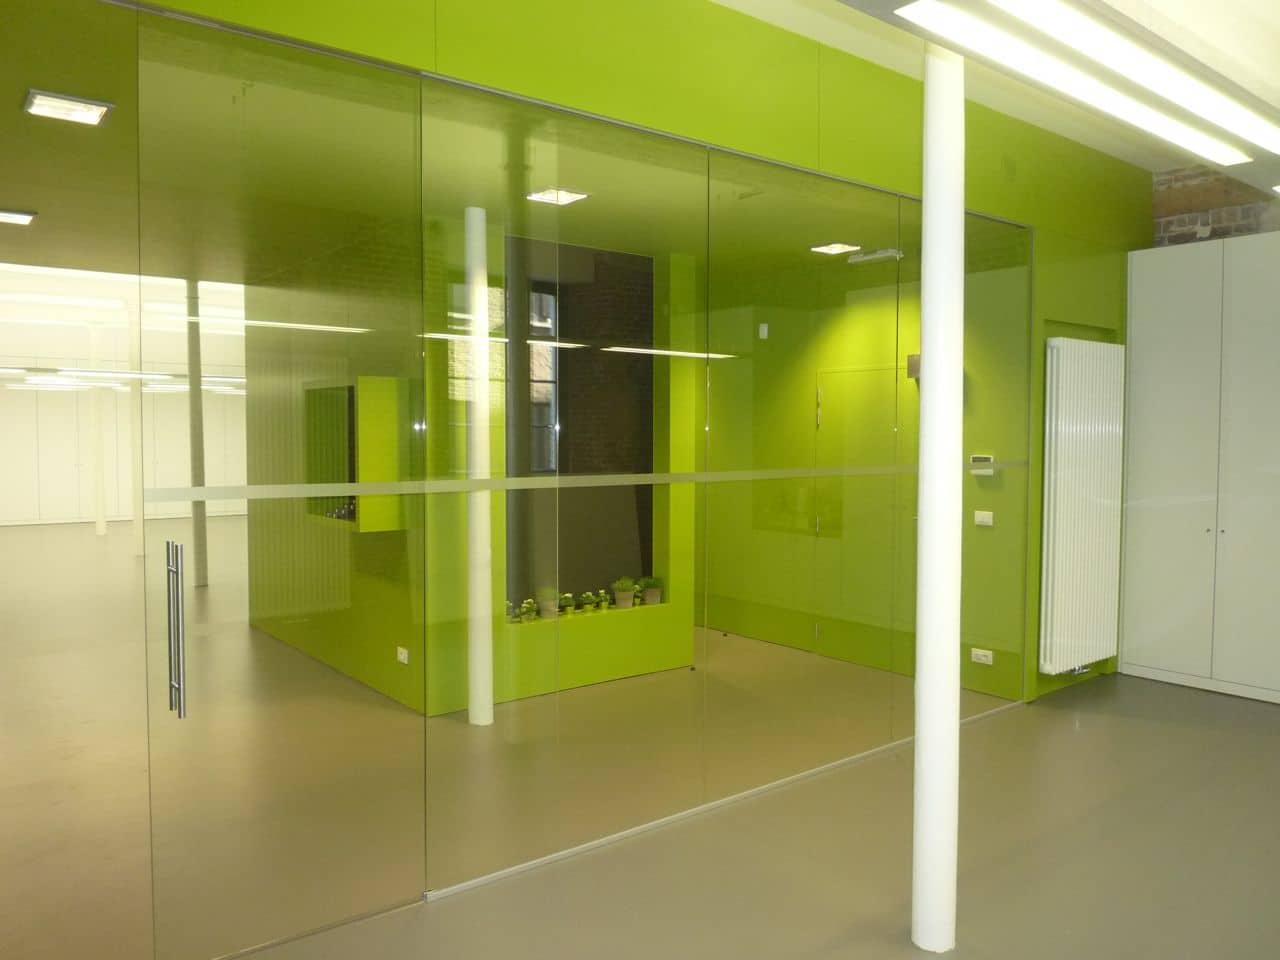 P1060754 | Baeyens & Beck architecten Gent | architect nieuwbouw renovatie interieur | high end | architectenbureau